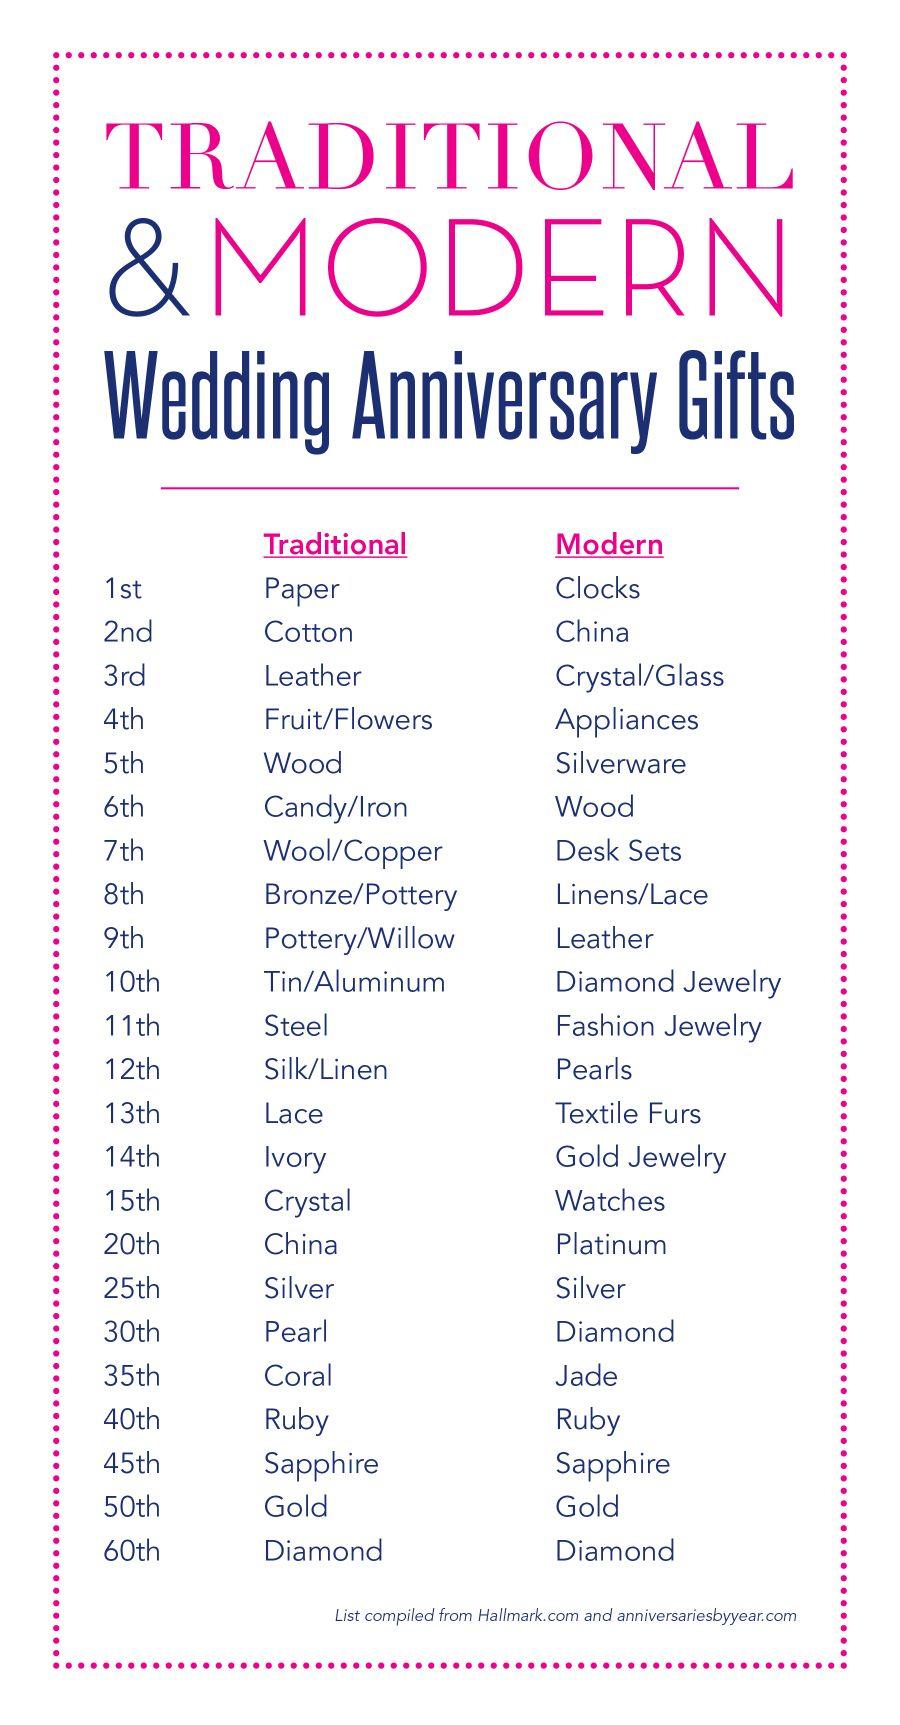 Wedding Anniversary Gifts Marriage Anniversary Gifts Second Anniversary Gift Marriage Anniversary